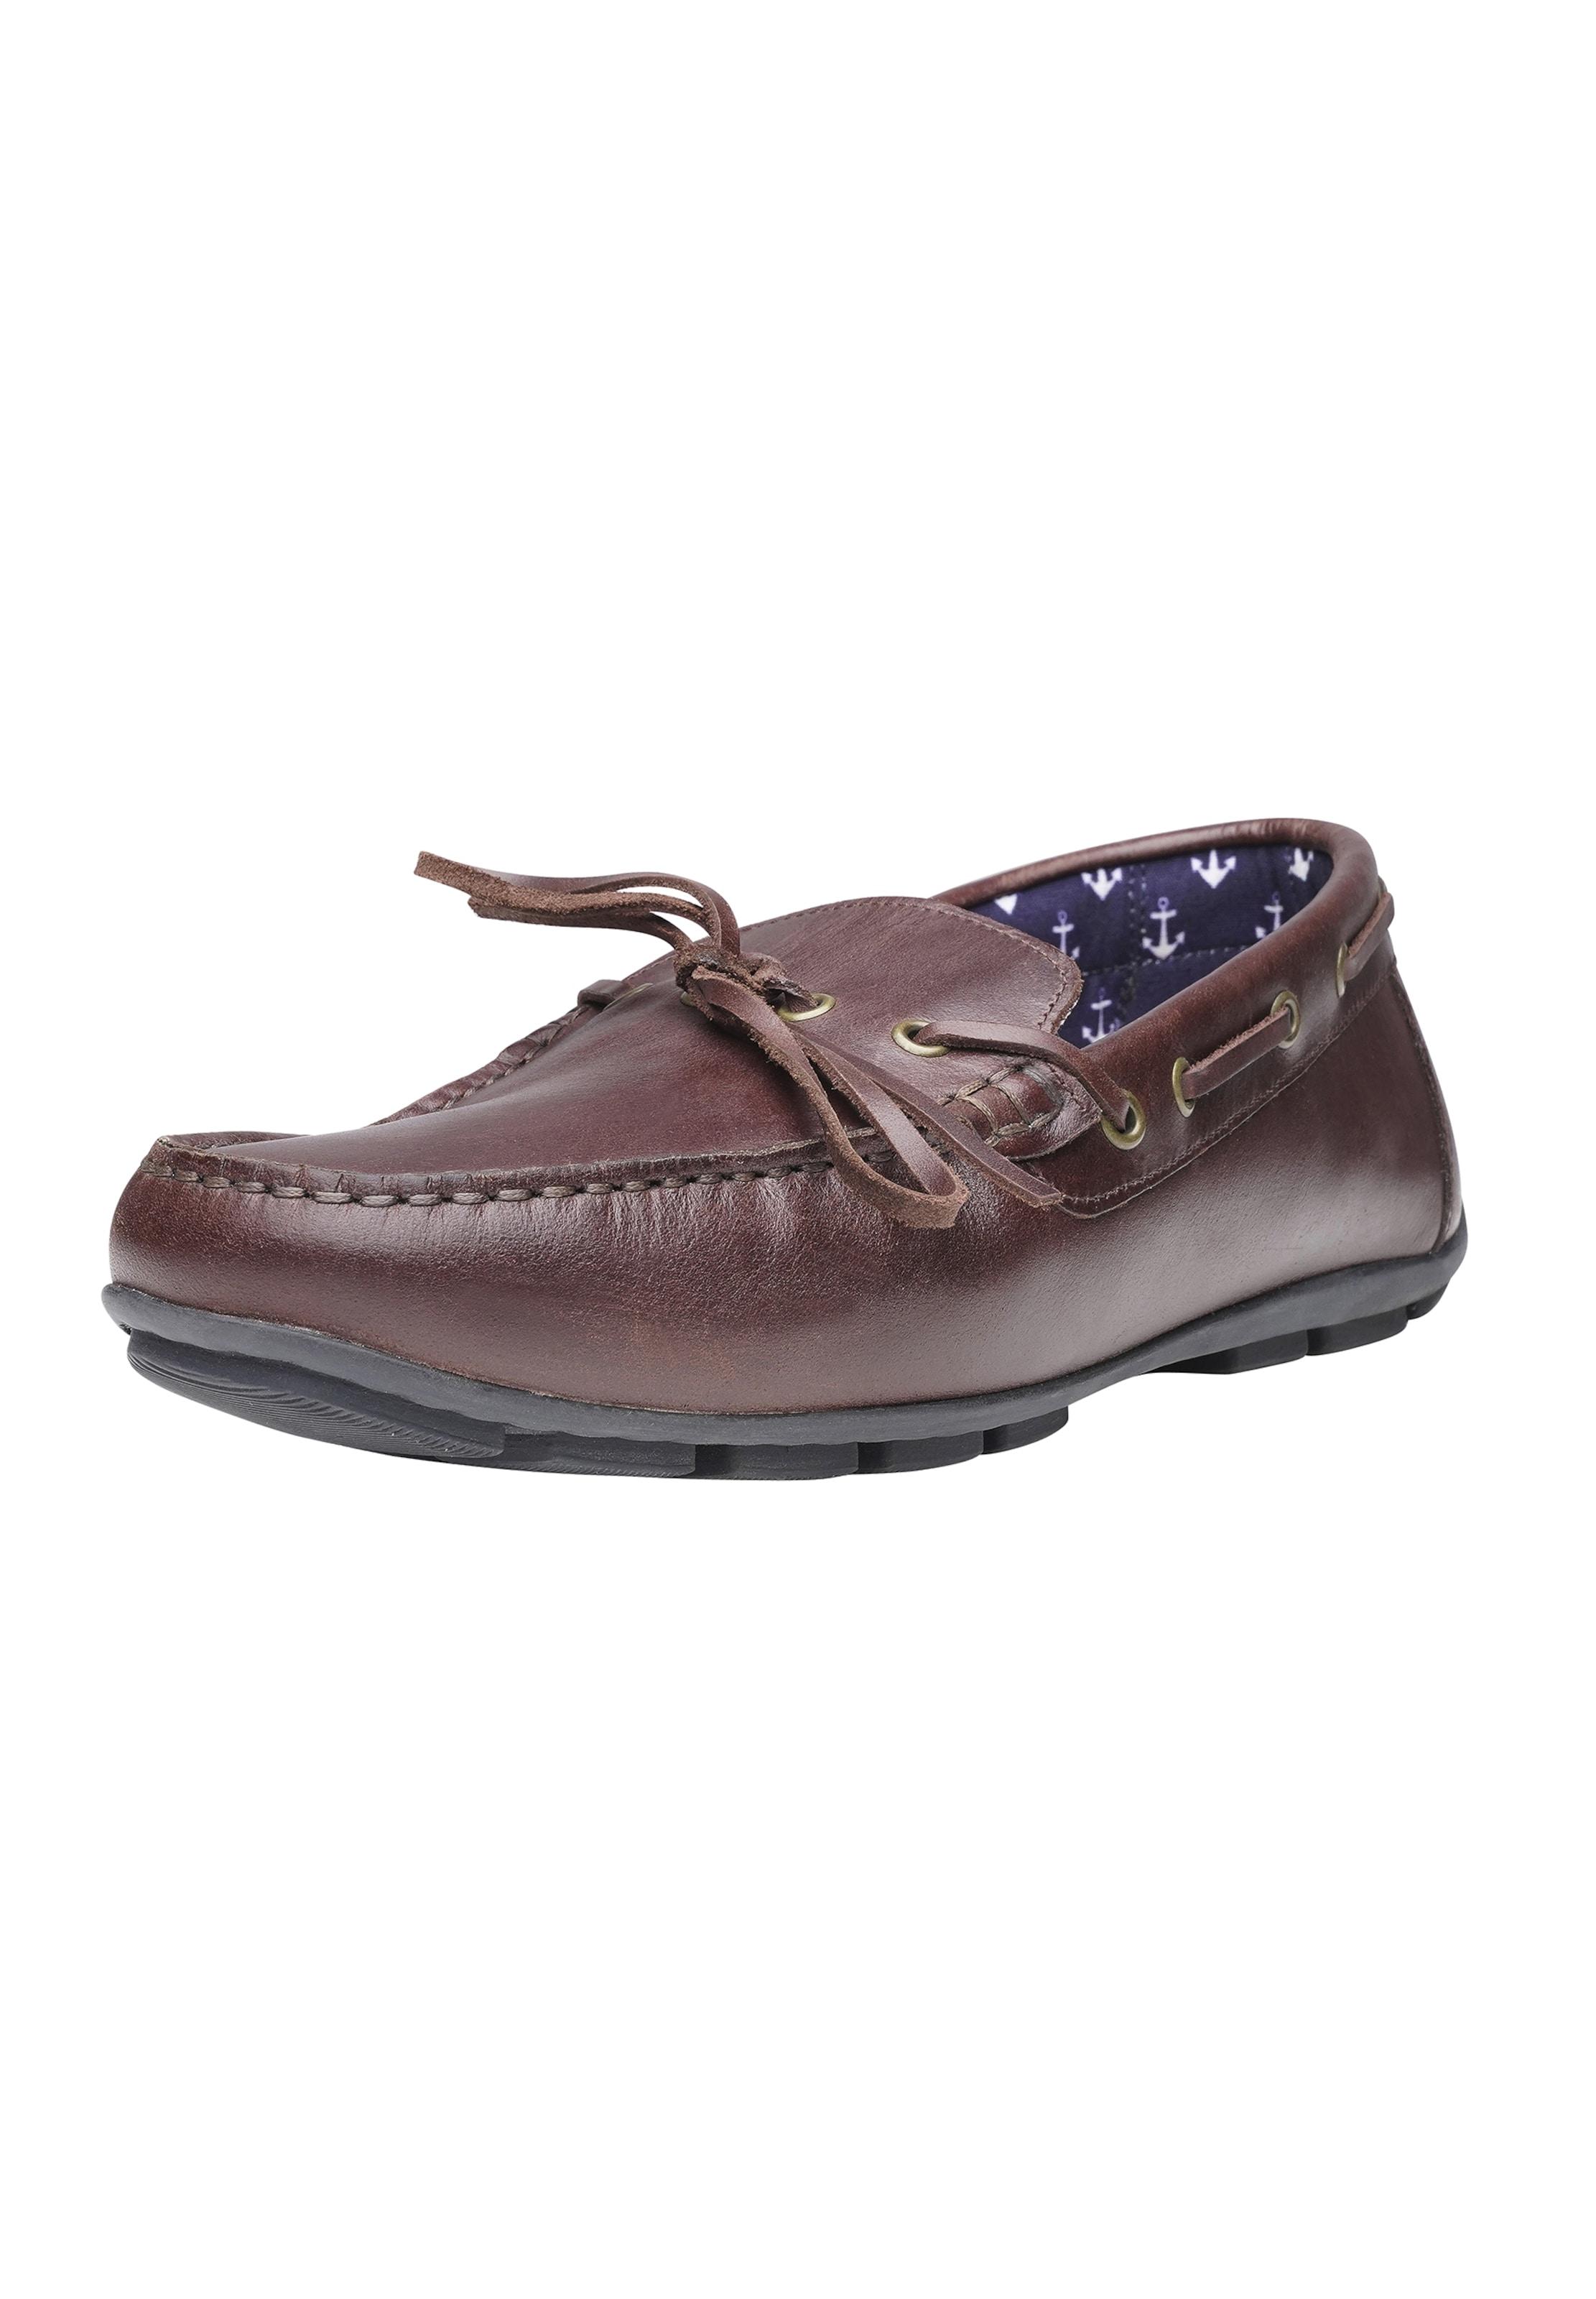 Shoepassion Mokassins 'no93 Mm' Braun In UzpSMV